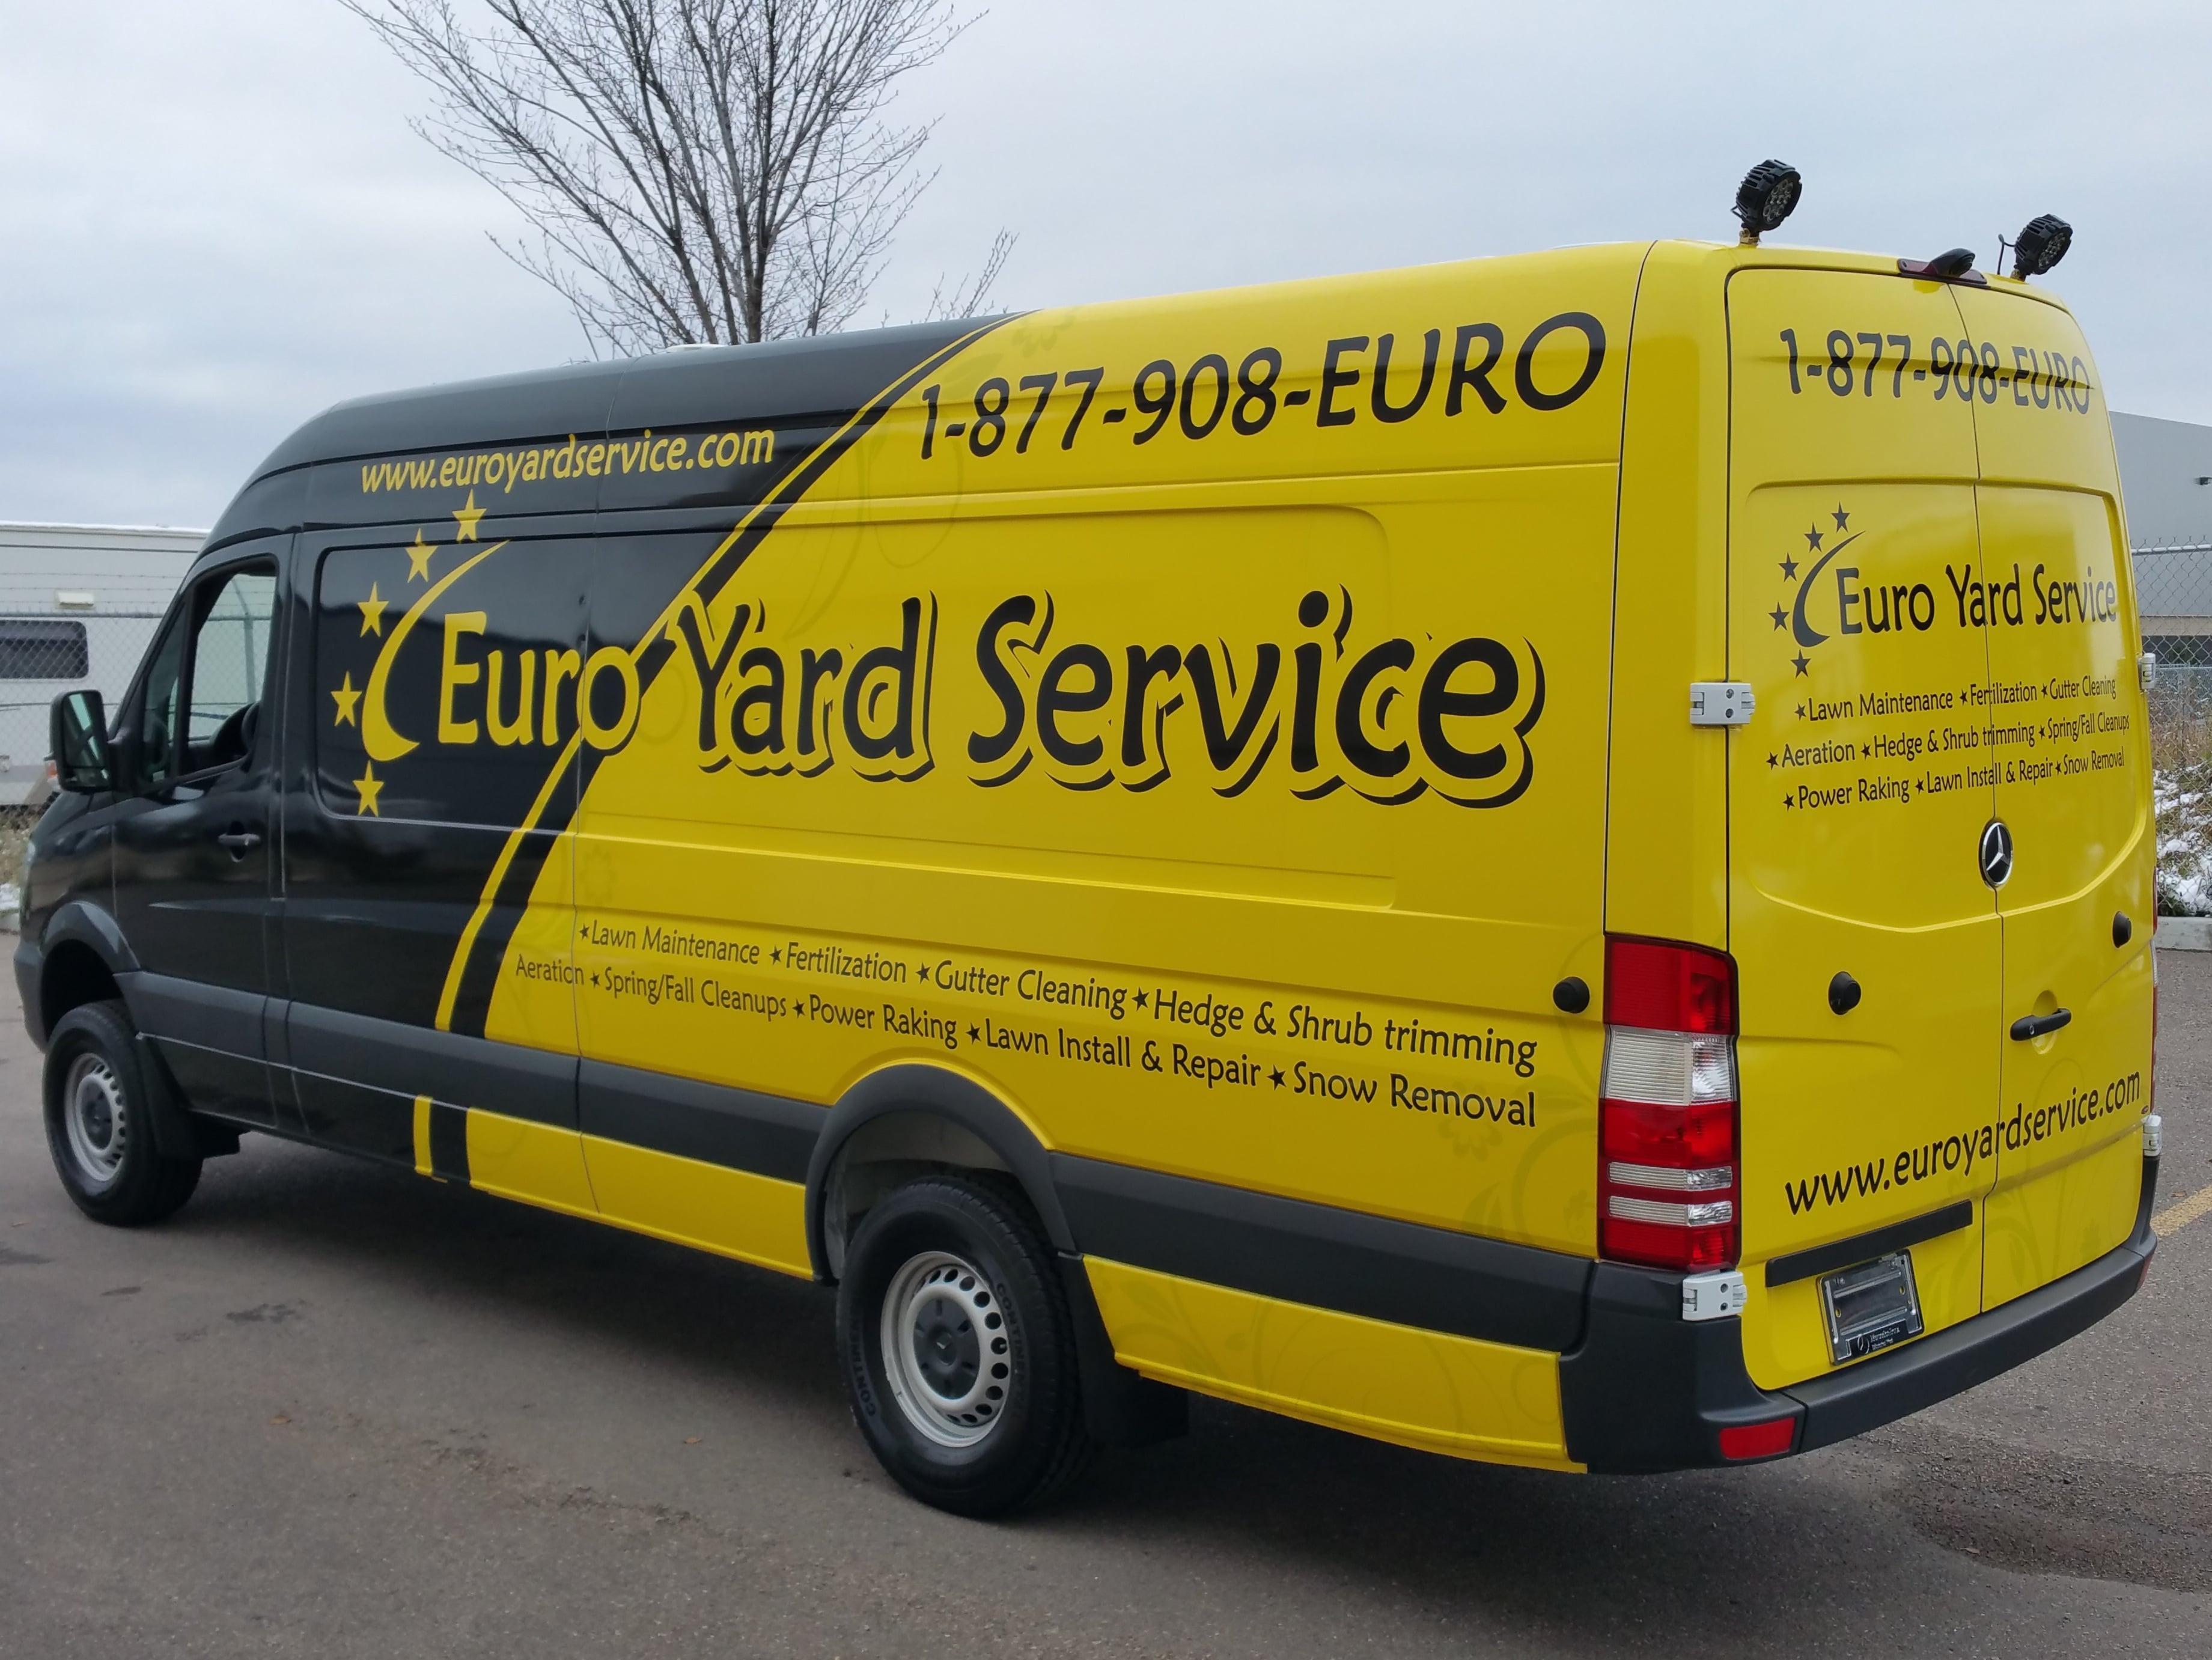 Euro Yard Services full vehicle wrap.